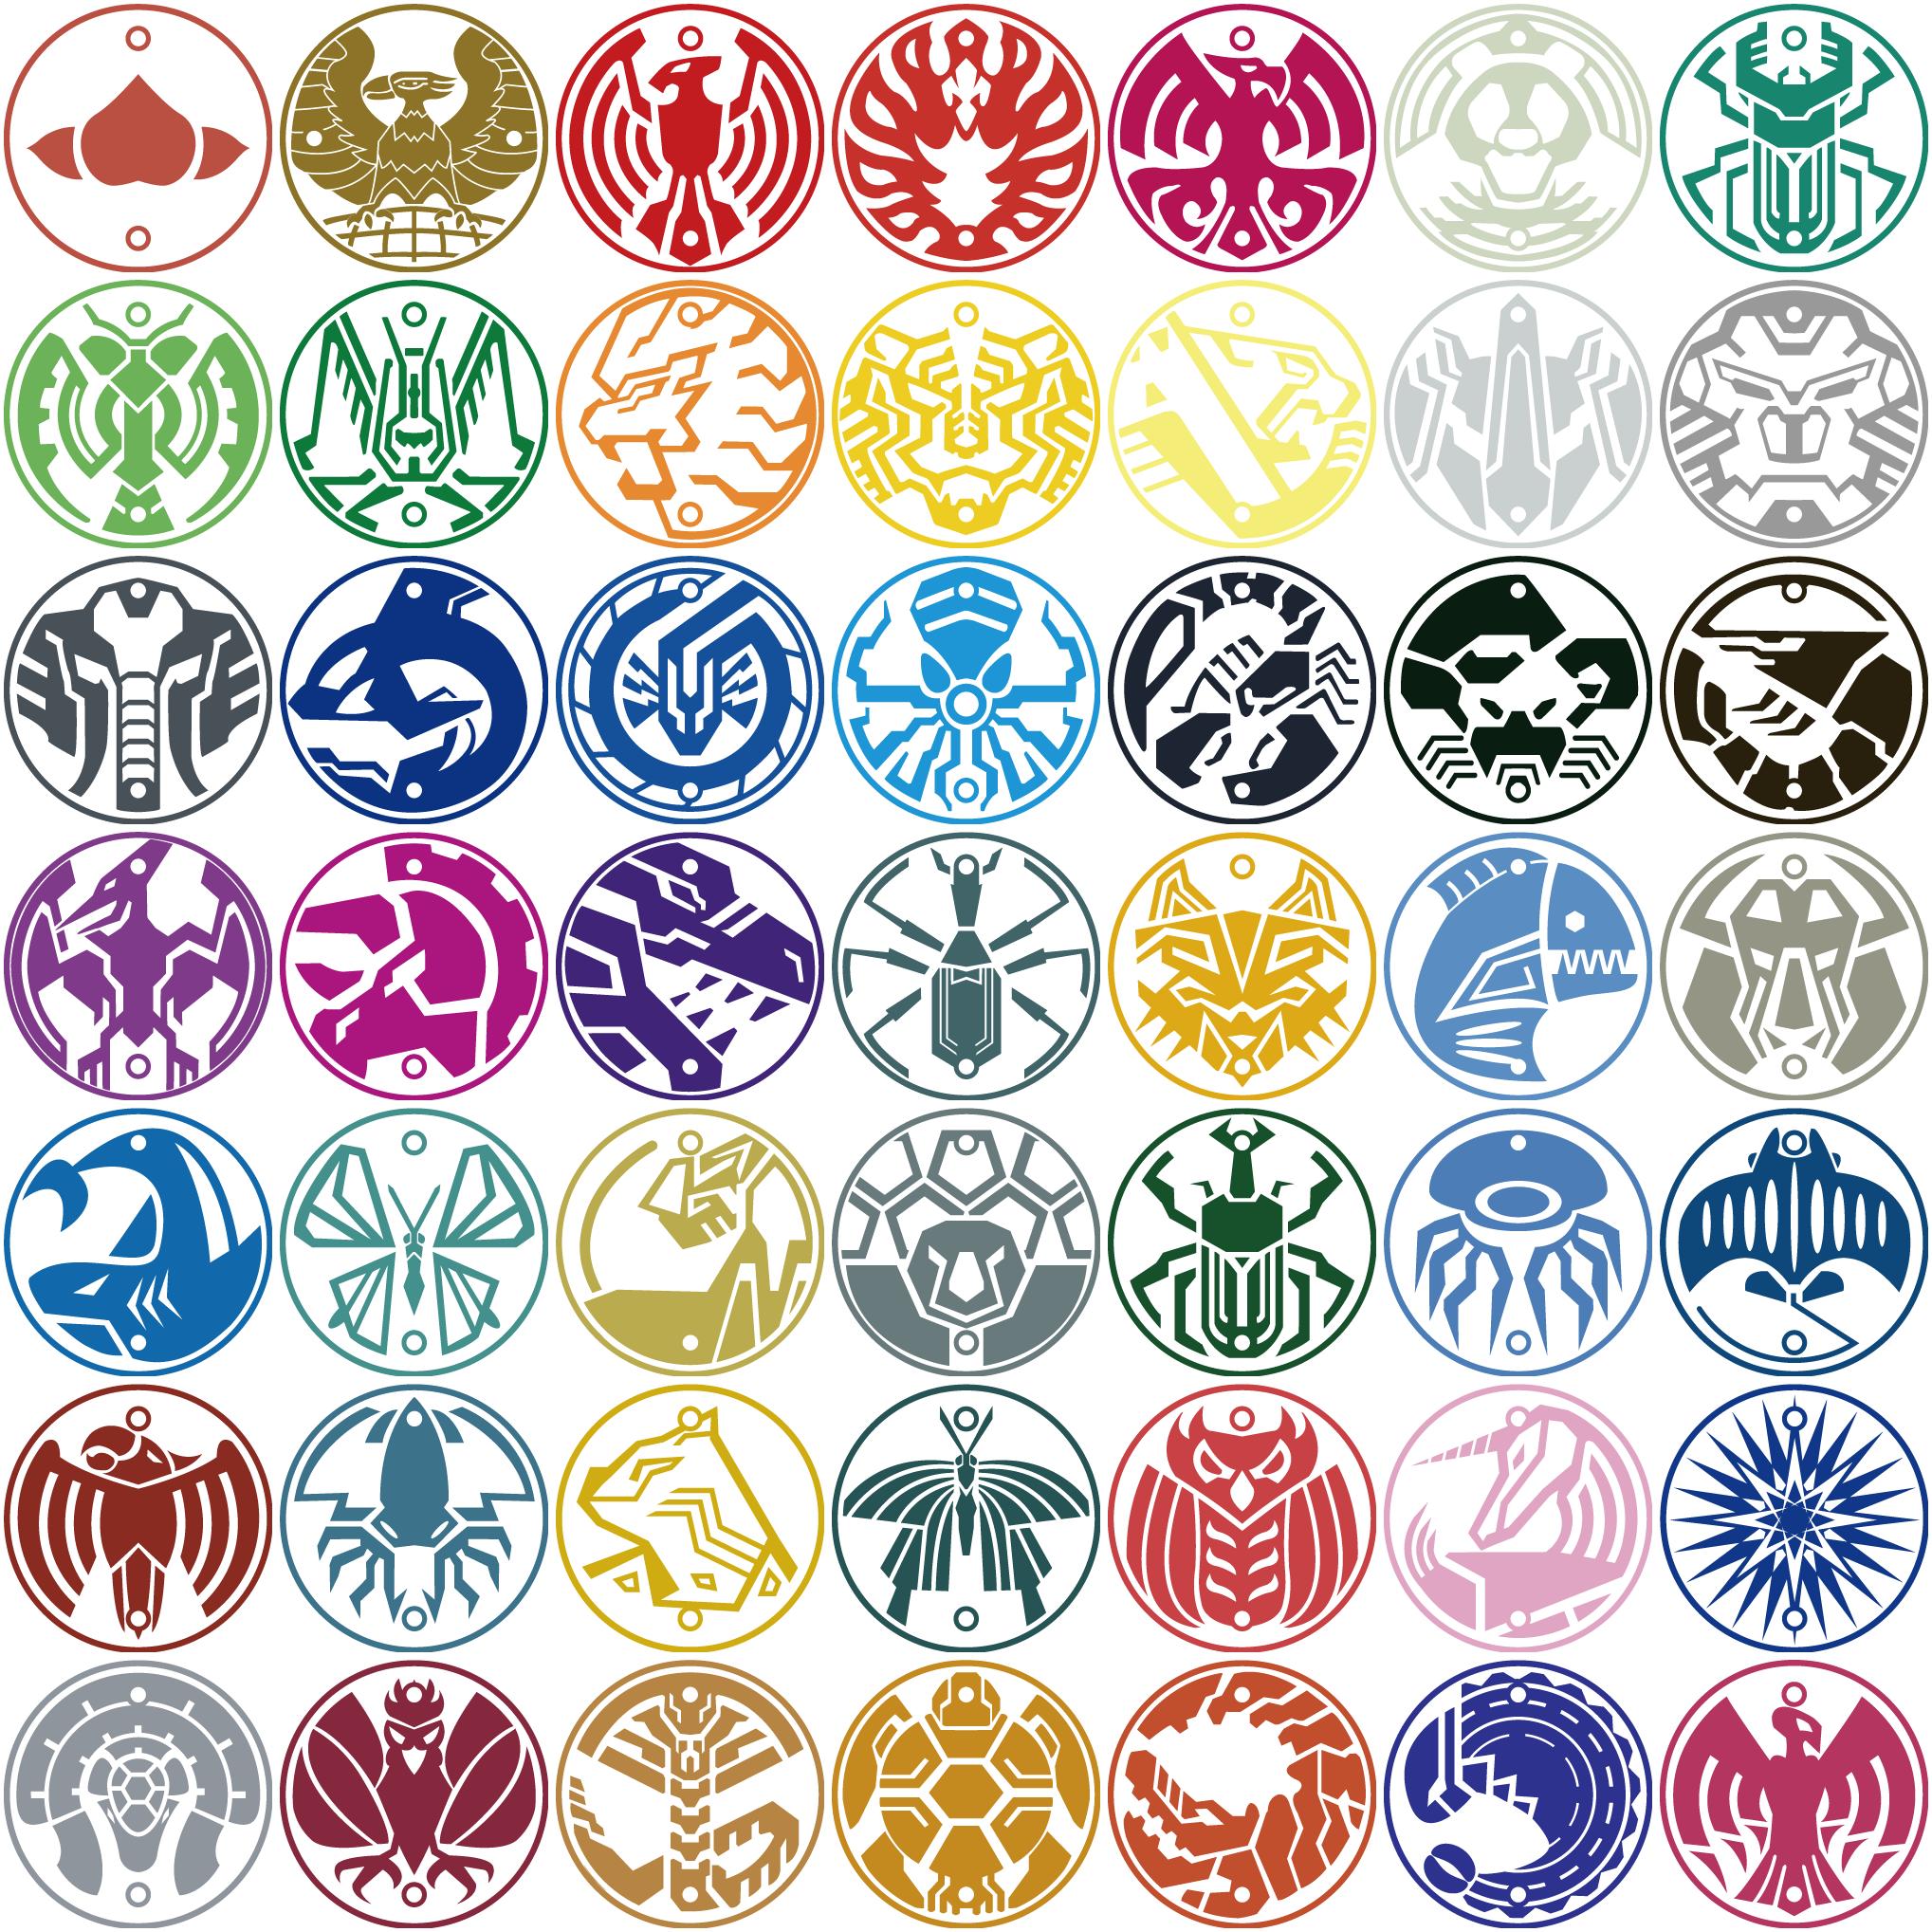 Symbols of the WILD! by prehistoricjack on DeviantArt